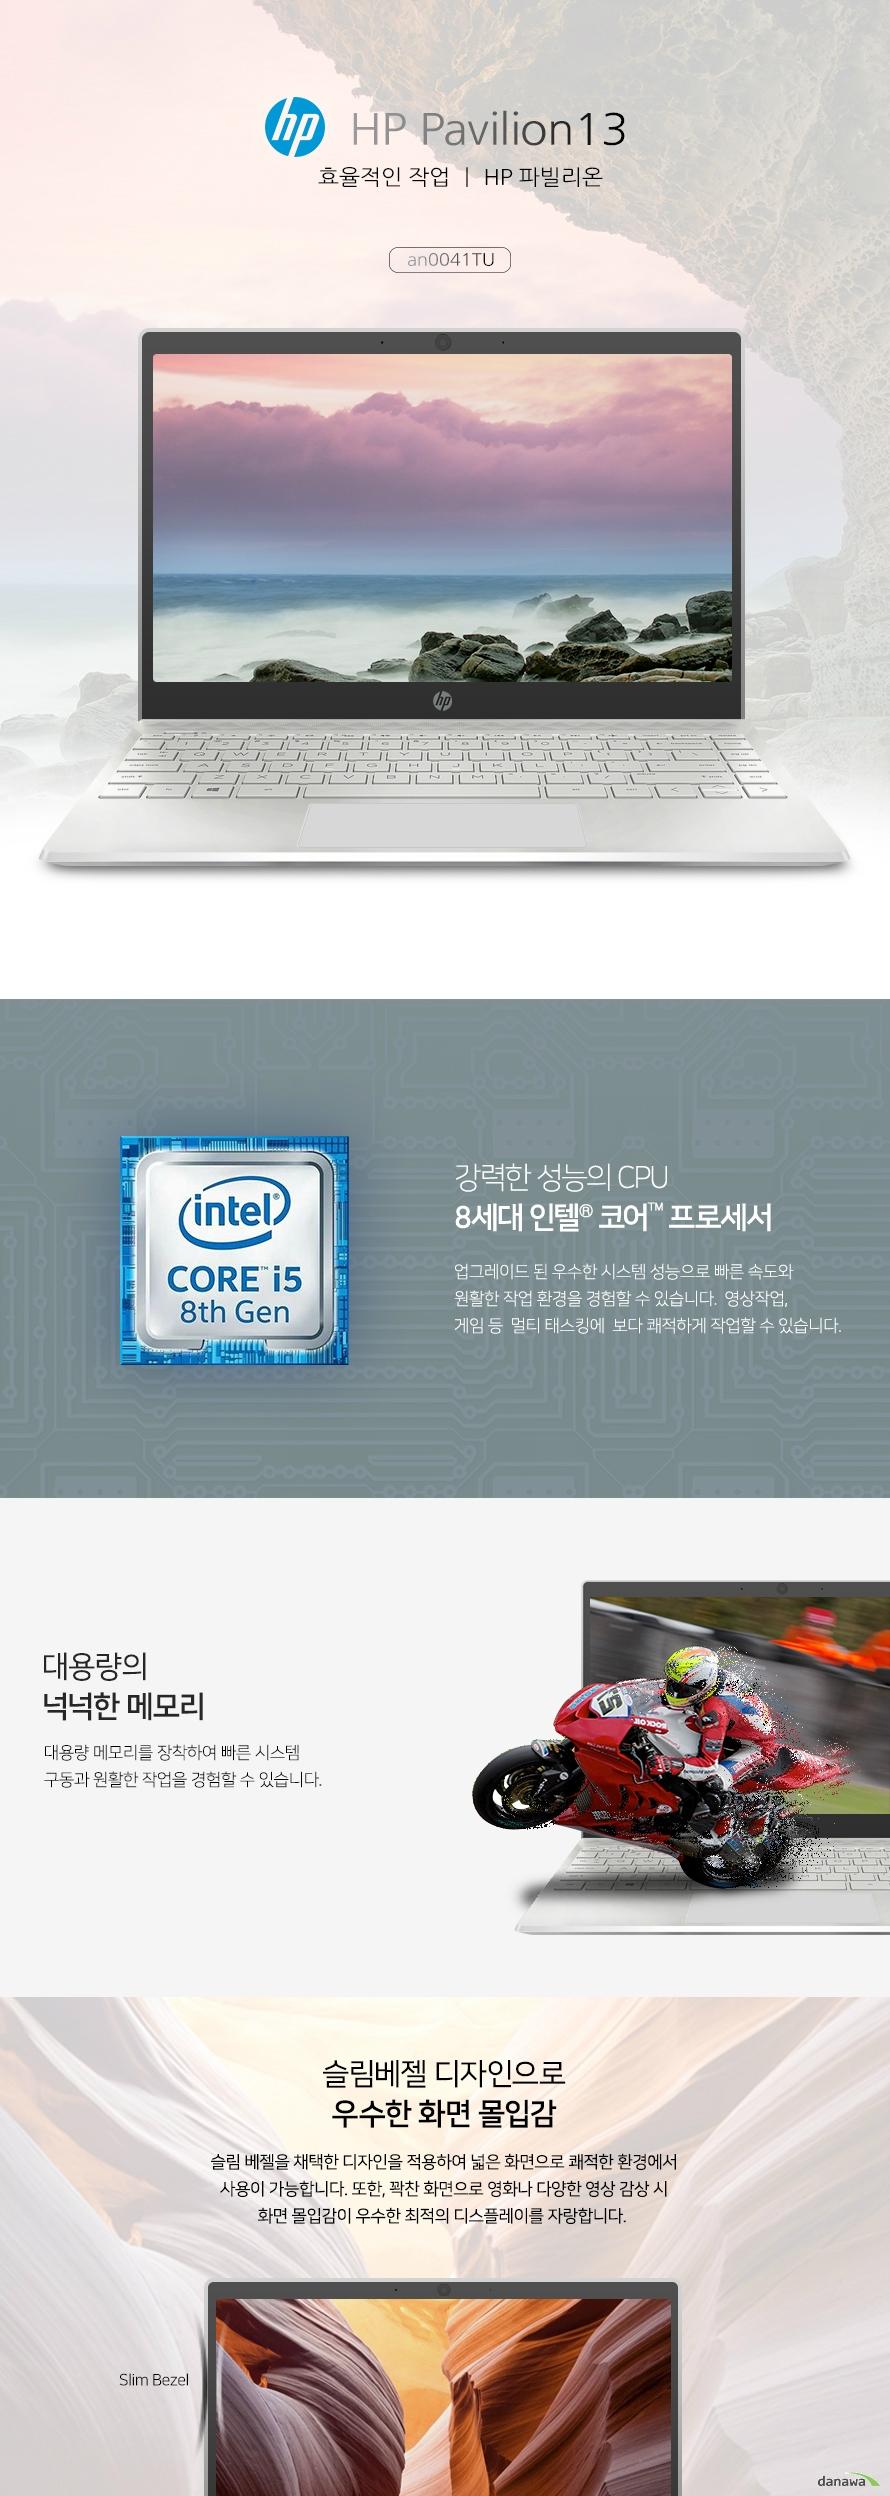 HP 파빌리온13 효율적인 작업 HP 파빌리온an0041TU 강력한 성능의 CPU 8세대 인텔 코어 프로세서 업그레이드 된 우수한 시스템 성능으로 빠른 속도와 원활한 작업 환경을 경험할 수 있습니다. 영상작업, 게임 등 멀티 태스킹에 보다 쾌적하게 작업할 수 있습니다. 대용량의 넉넉한 메모리 대용량 메모리를 장착하여 빠른 시스템 구동과 원활한 작업을 경험할 수 있습니다. 슬림베젤 디자인으로 우수한 화면 몰입감 슬림 베젤을 채택한 디자인을 적용하여 넓은 화면으로 쾌적한 환경에서 사용이 가능합니다. 또한, 꽉찬 화면으로 영화나 다양한 영상 감상시 화면 몰입감이 우수한 최적의 디스플레이를 자랑합니다. 광시야각 IPS 패널 장착 IPS 패널 장착으로 넓은 시야각을 자랑합니다. Full HD 해상도로 어느 각도에서나 선명한 화질로 영상을 감상하고 작업할 수 있습니다. 오랜시간 사용 가능한 All Day BaTTERY HP만의 우수한 기술력으로 최대 11시간동안 충전없이 사용이 가능합니다. 이동 시에나 야외에서도 장시간 사용이 가능하여 효율적입니다. 생생하고 실감나는 HP만의 명품 사운드 뱅앤올룹슨의 기술력으로 탄생한 스피커를 탑재하였습니다. 최상의 명품 사운드를 발현하며 음악과 영화, 다양한 영상을 더욱 풍부한 몰입감으로 감상할 수 있습니다.